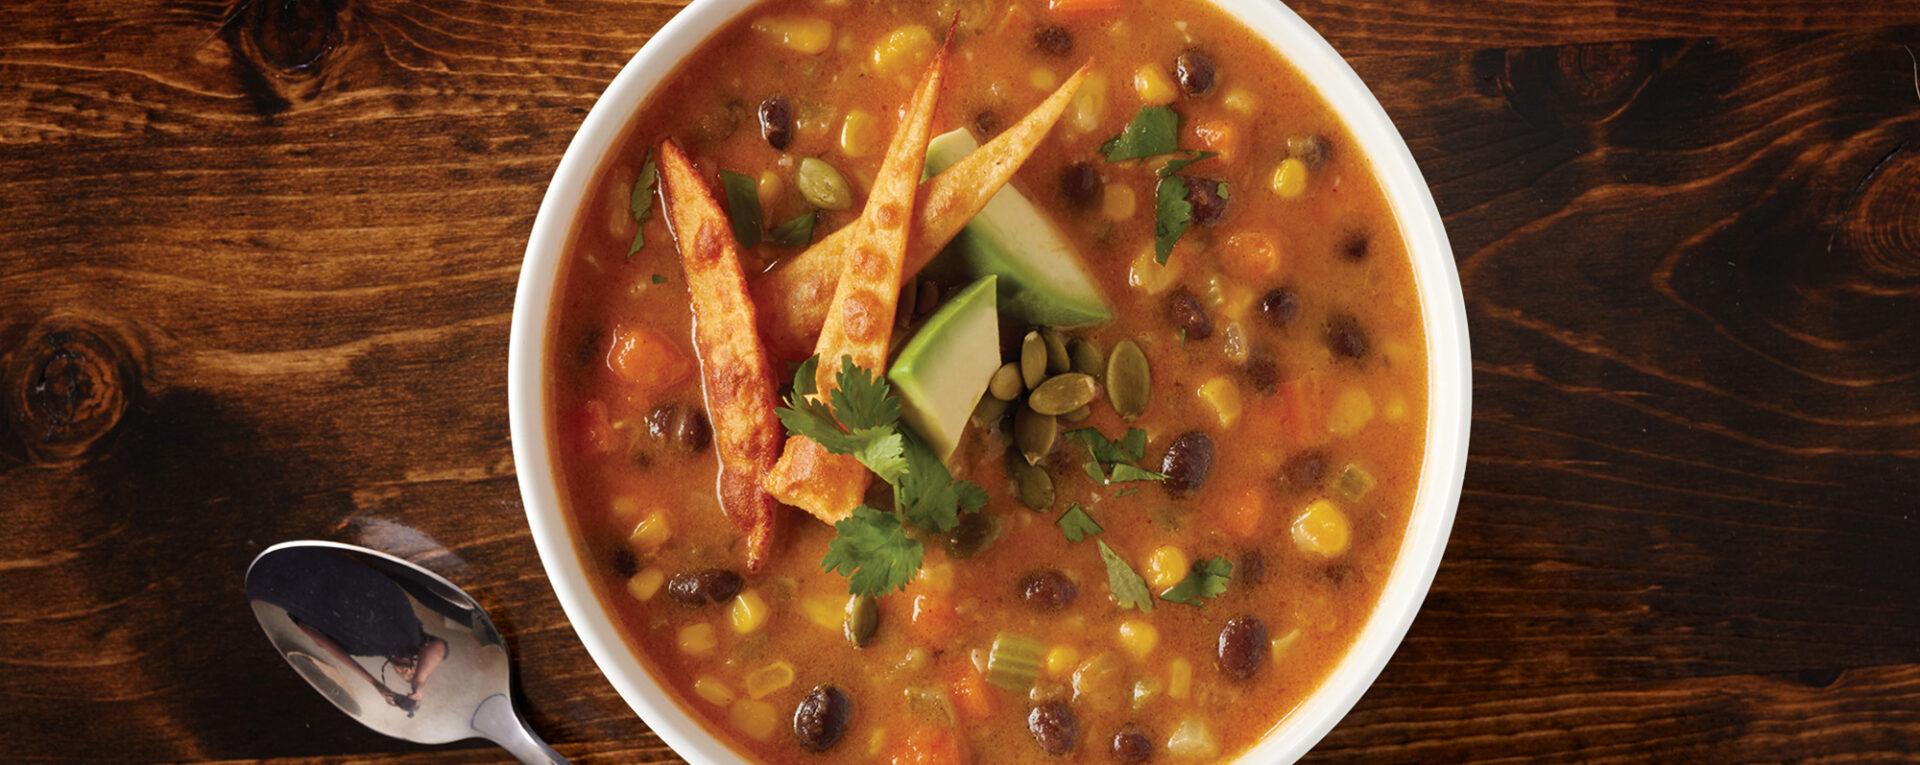 Creamy Pumpkin Tortilla Soup Recipe